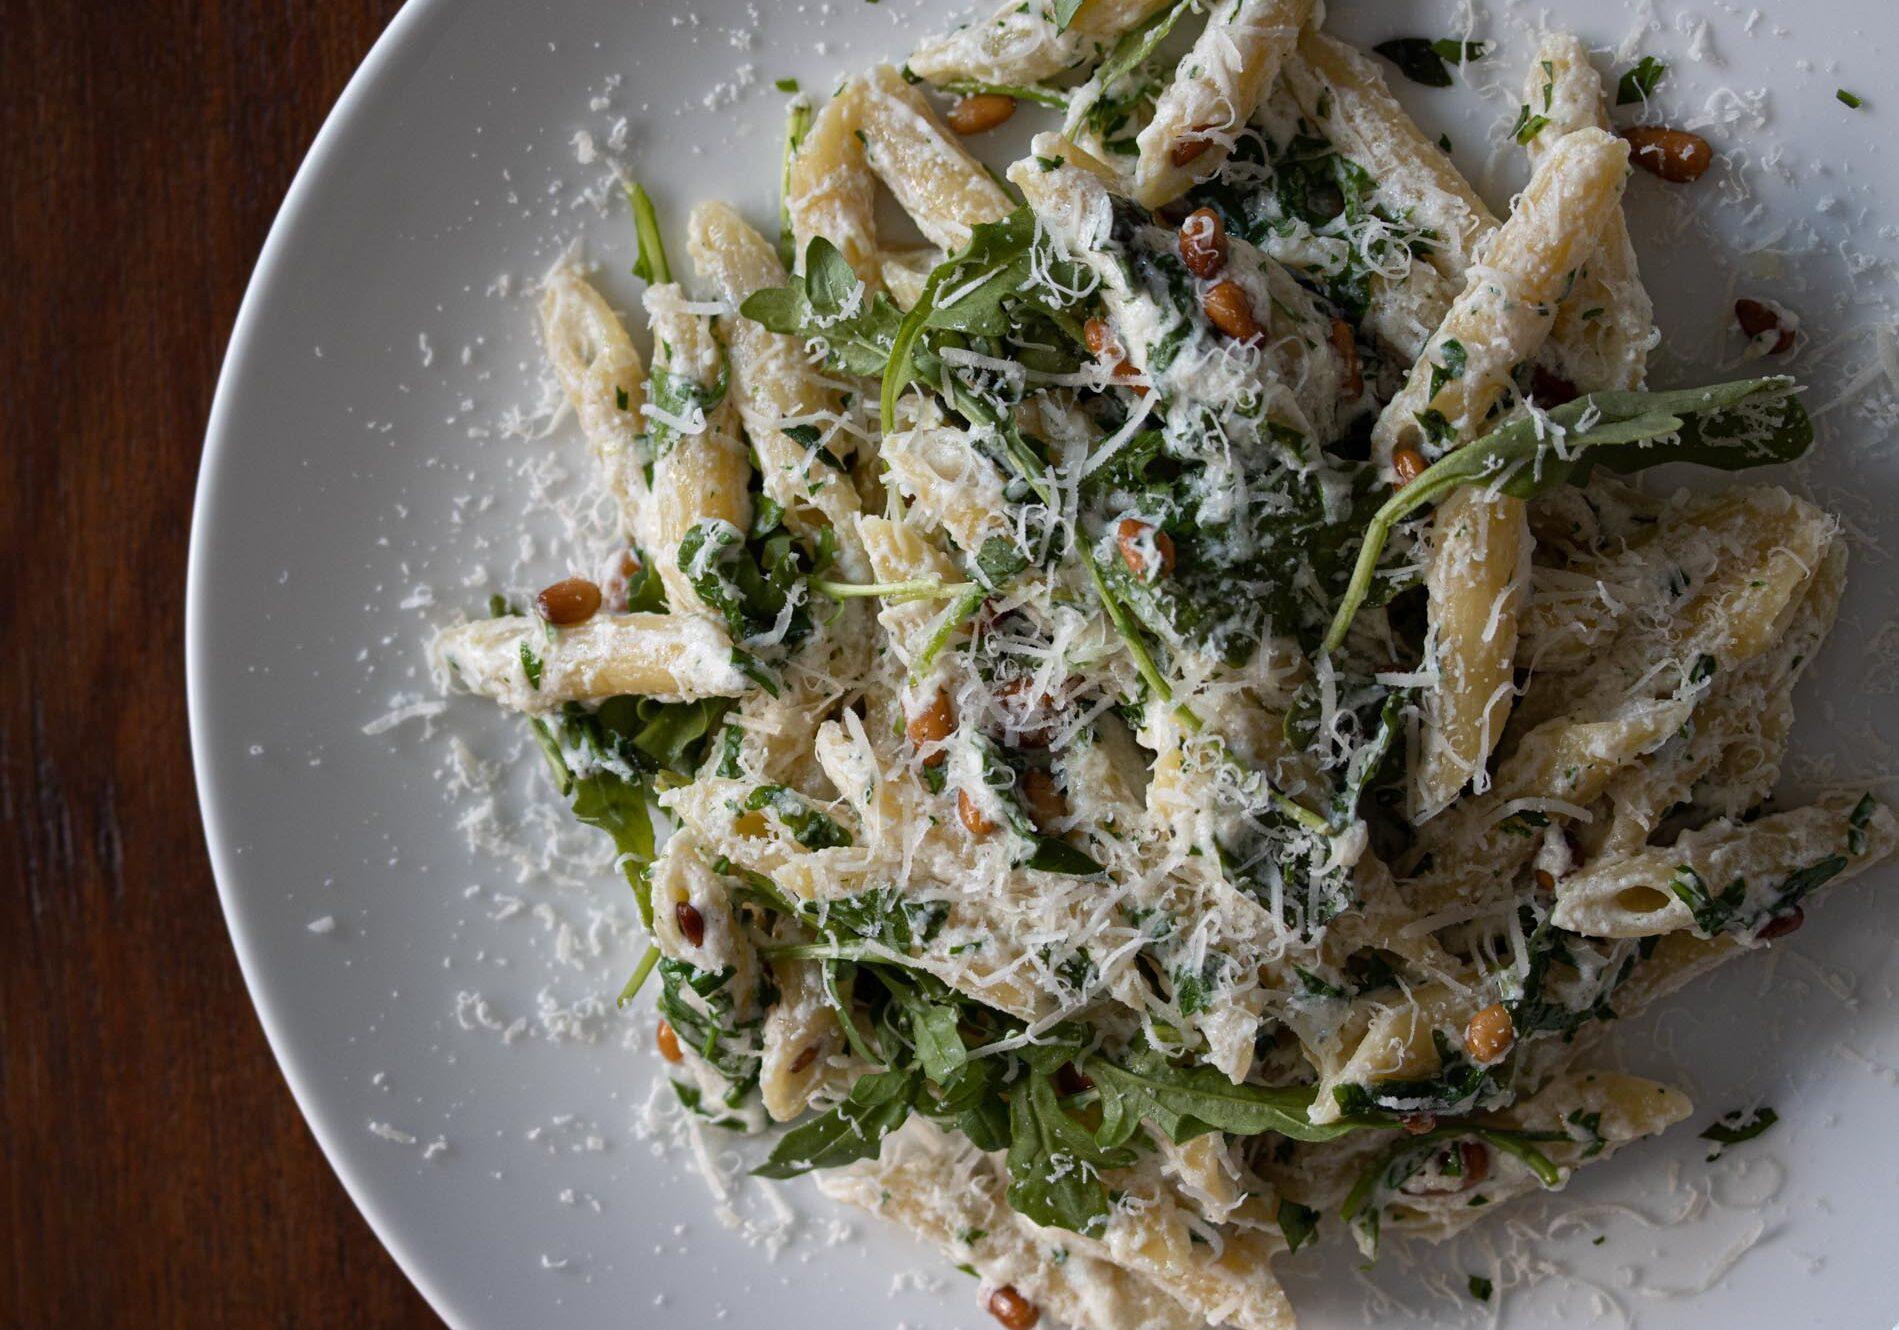 ricotta, arugula, pine nuts penne pasta